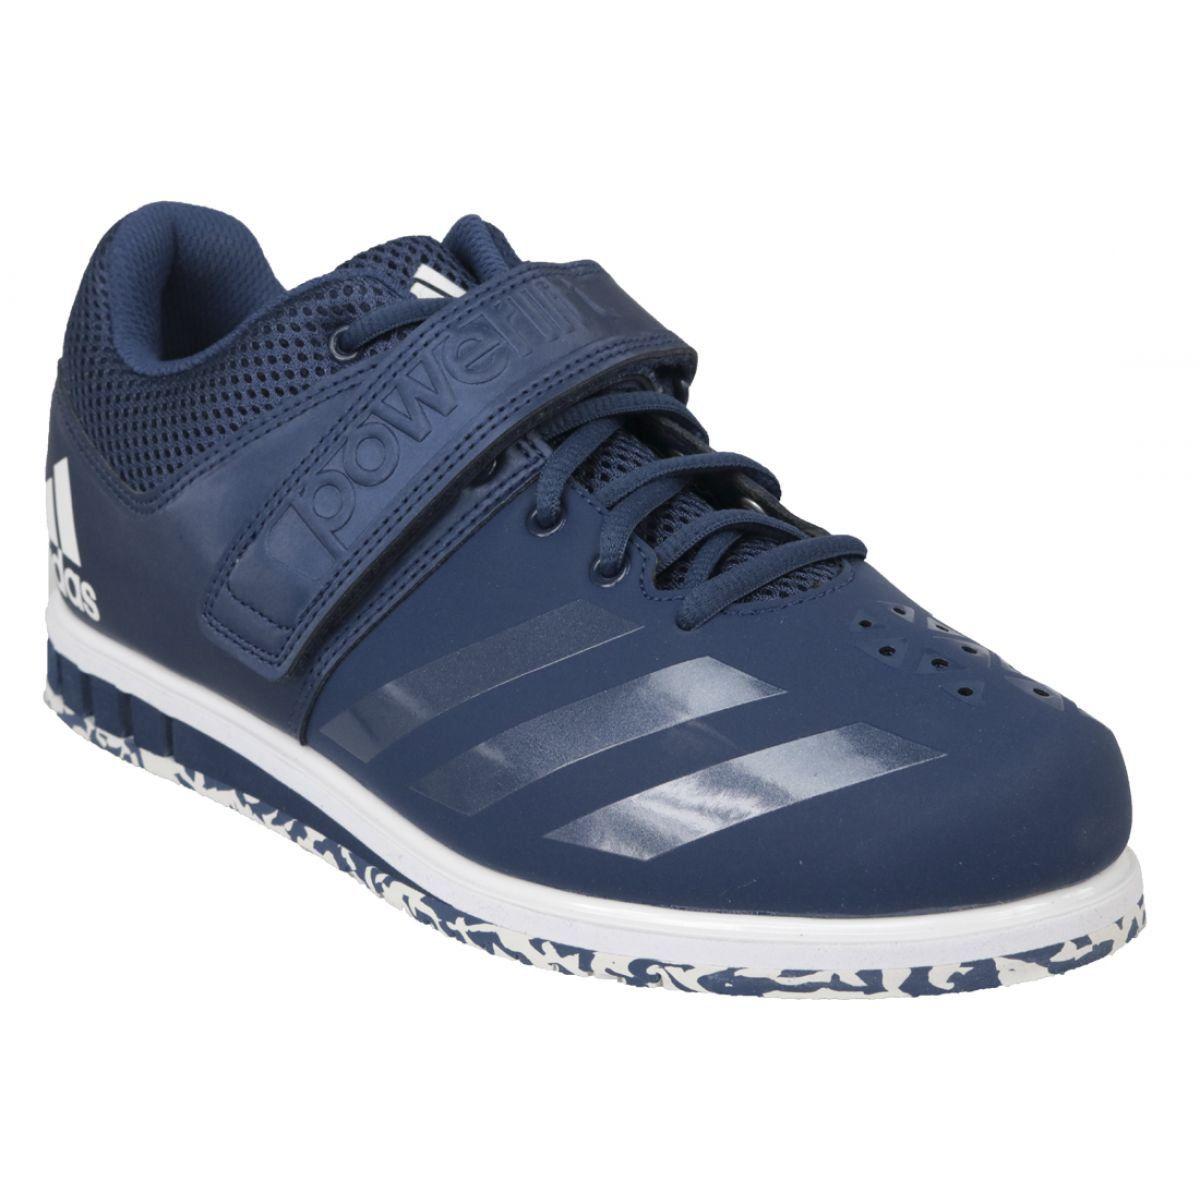 Buty Treningowe Adidas Powerlift 3 1 M Cq1772 Granatowe Adidas Sneakers Shoes Sneakers